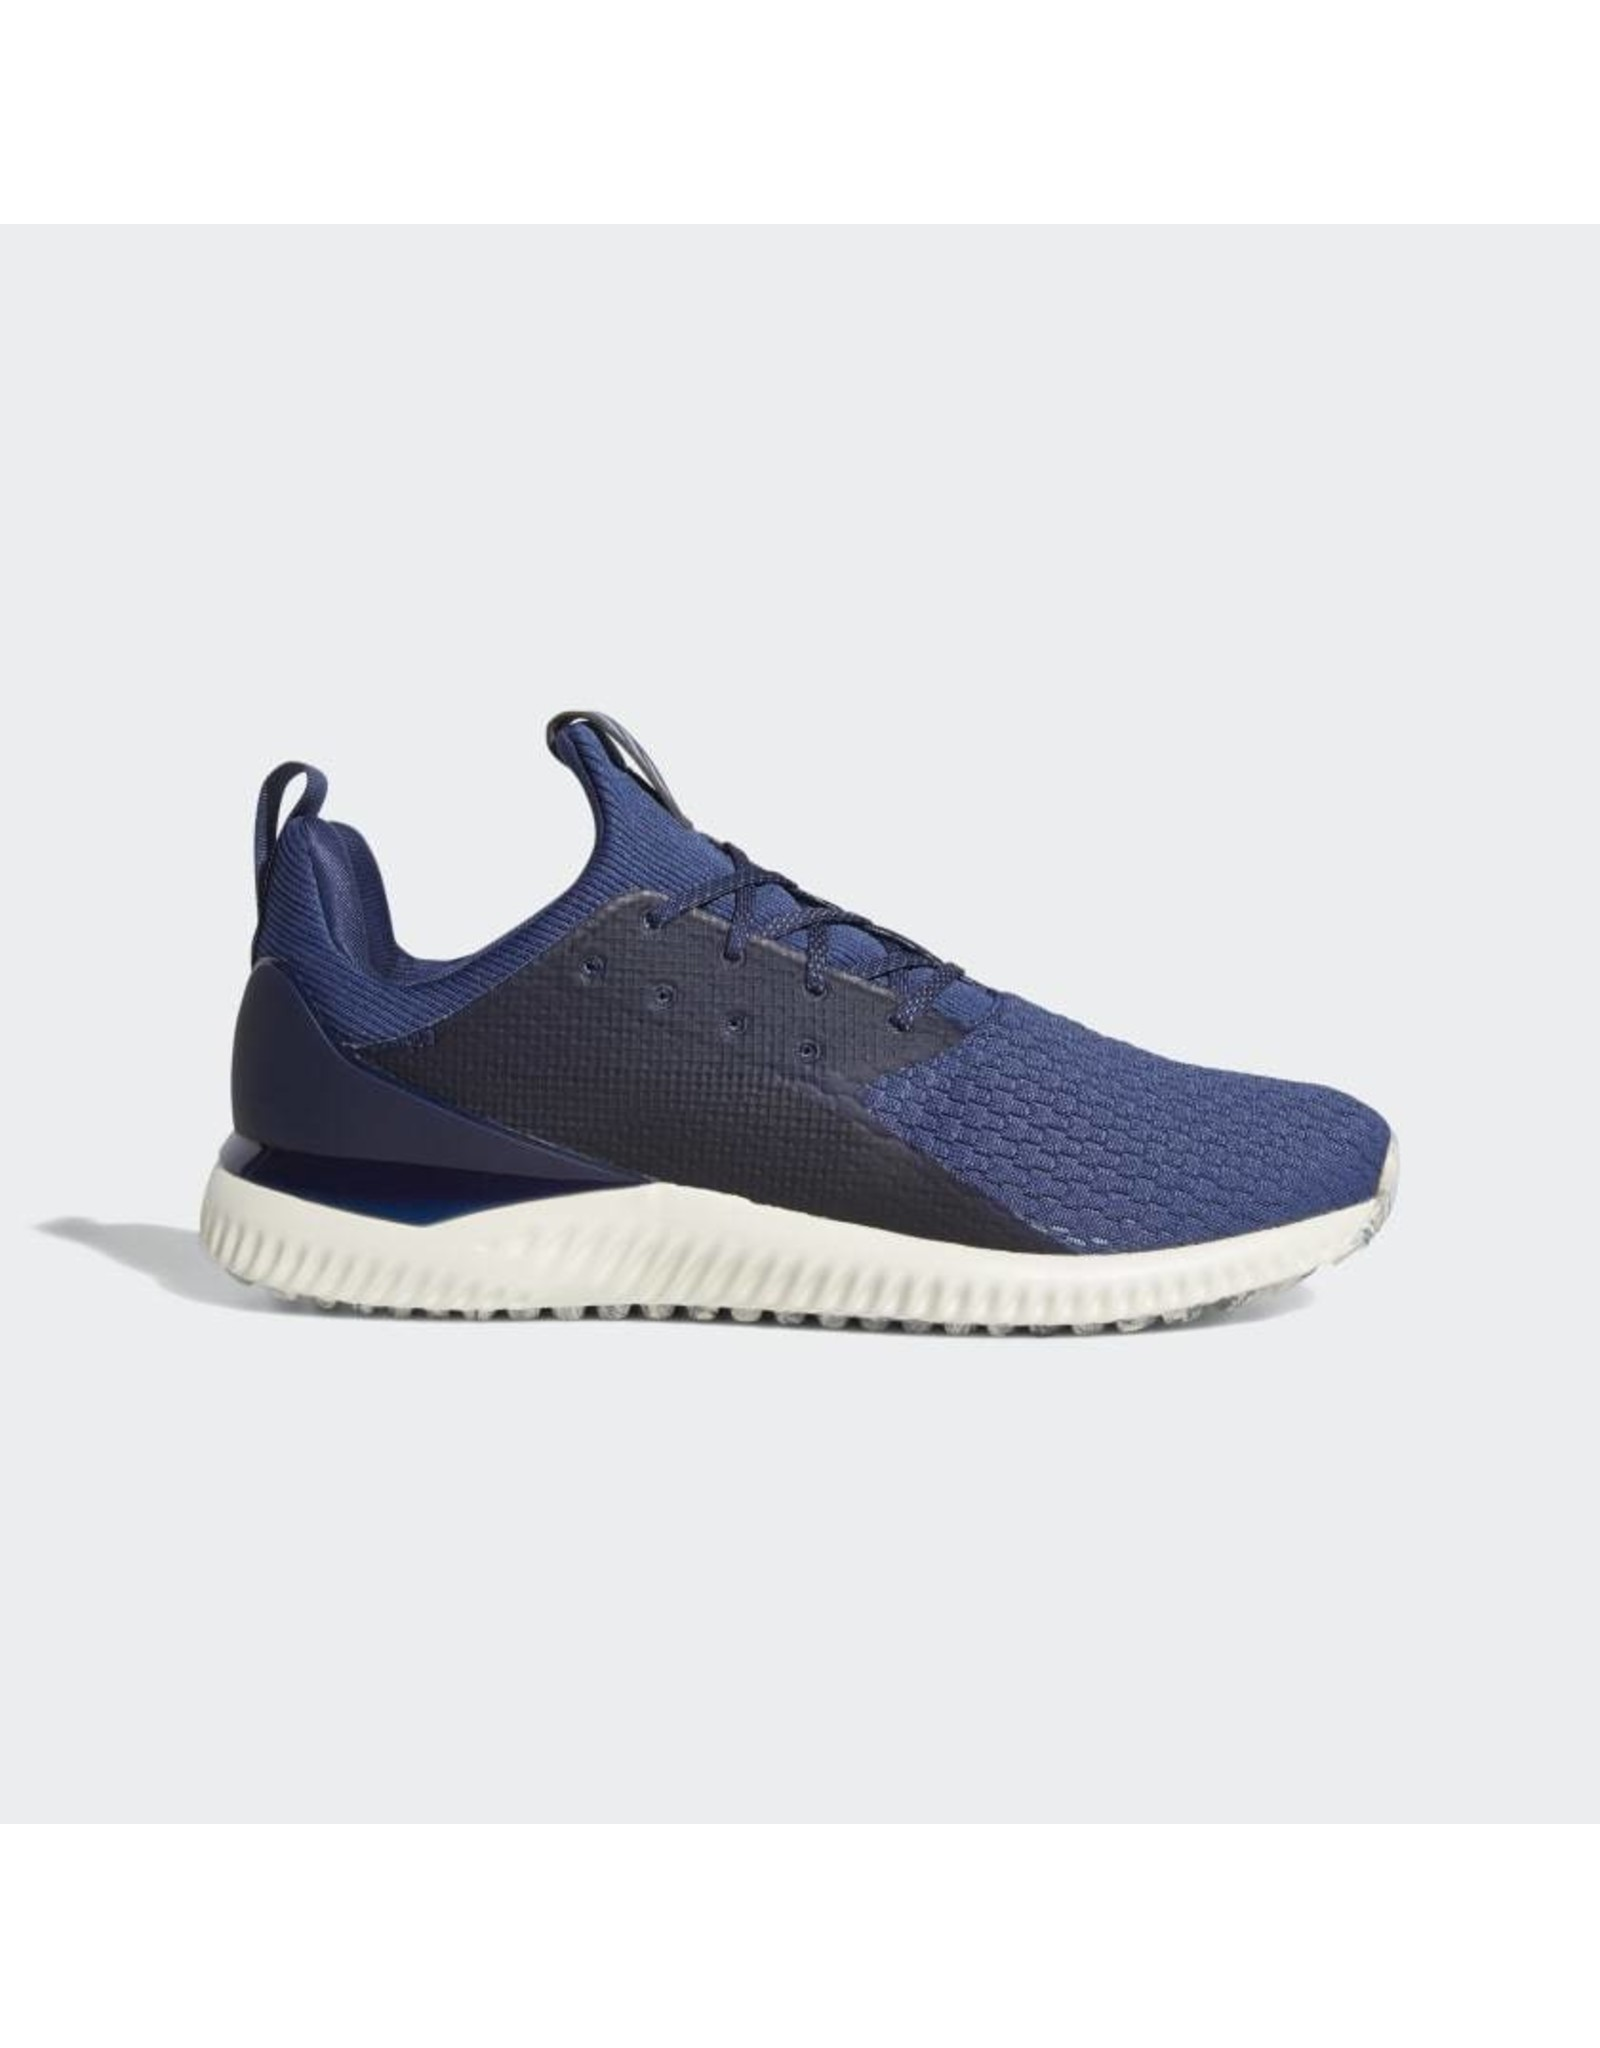 Adidas Adidas Adicross Bounce 2.0 Blue